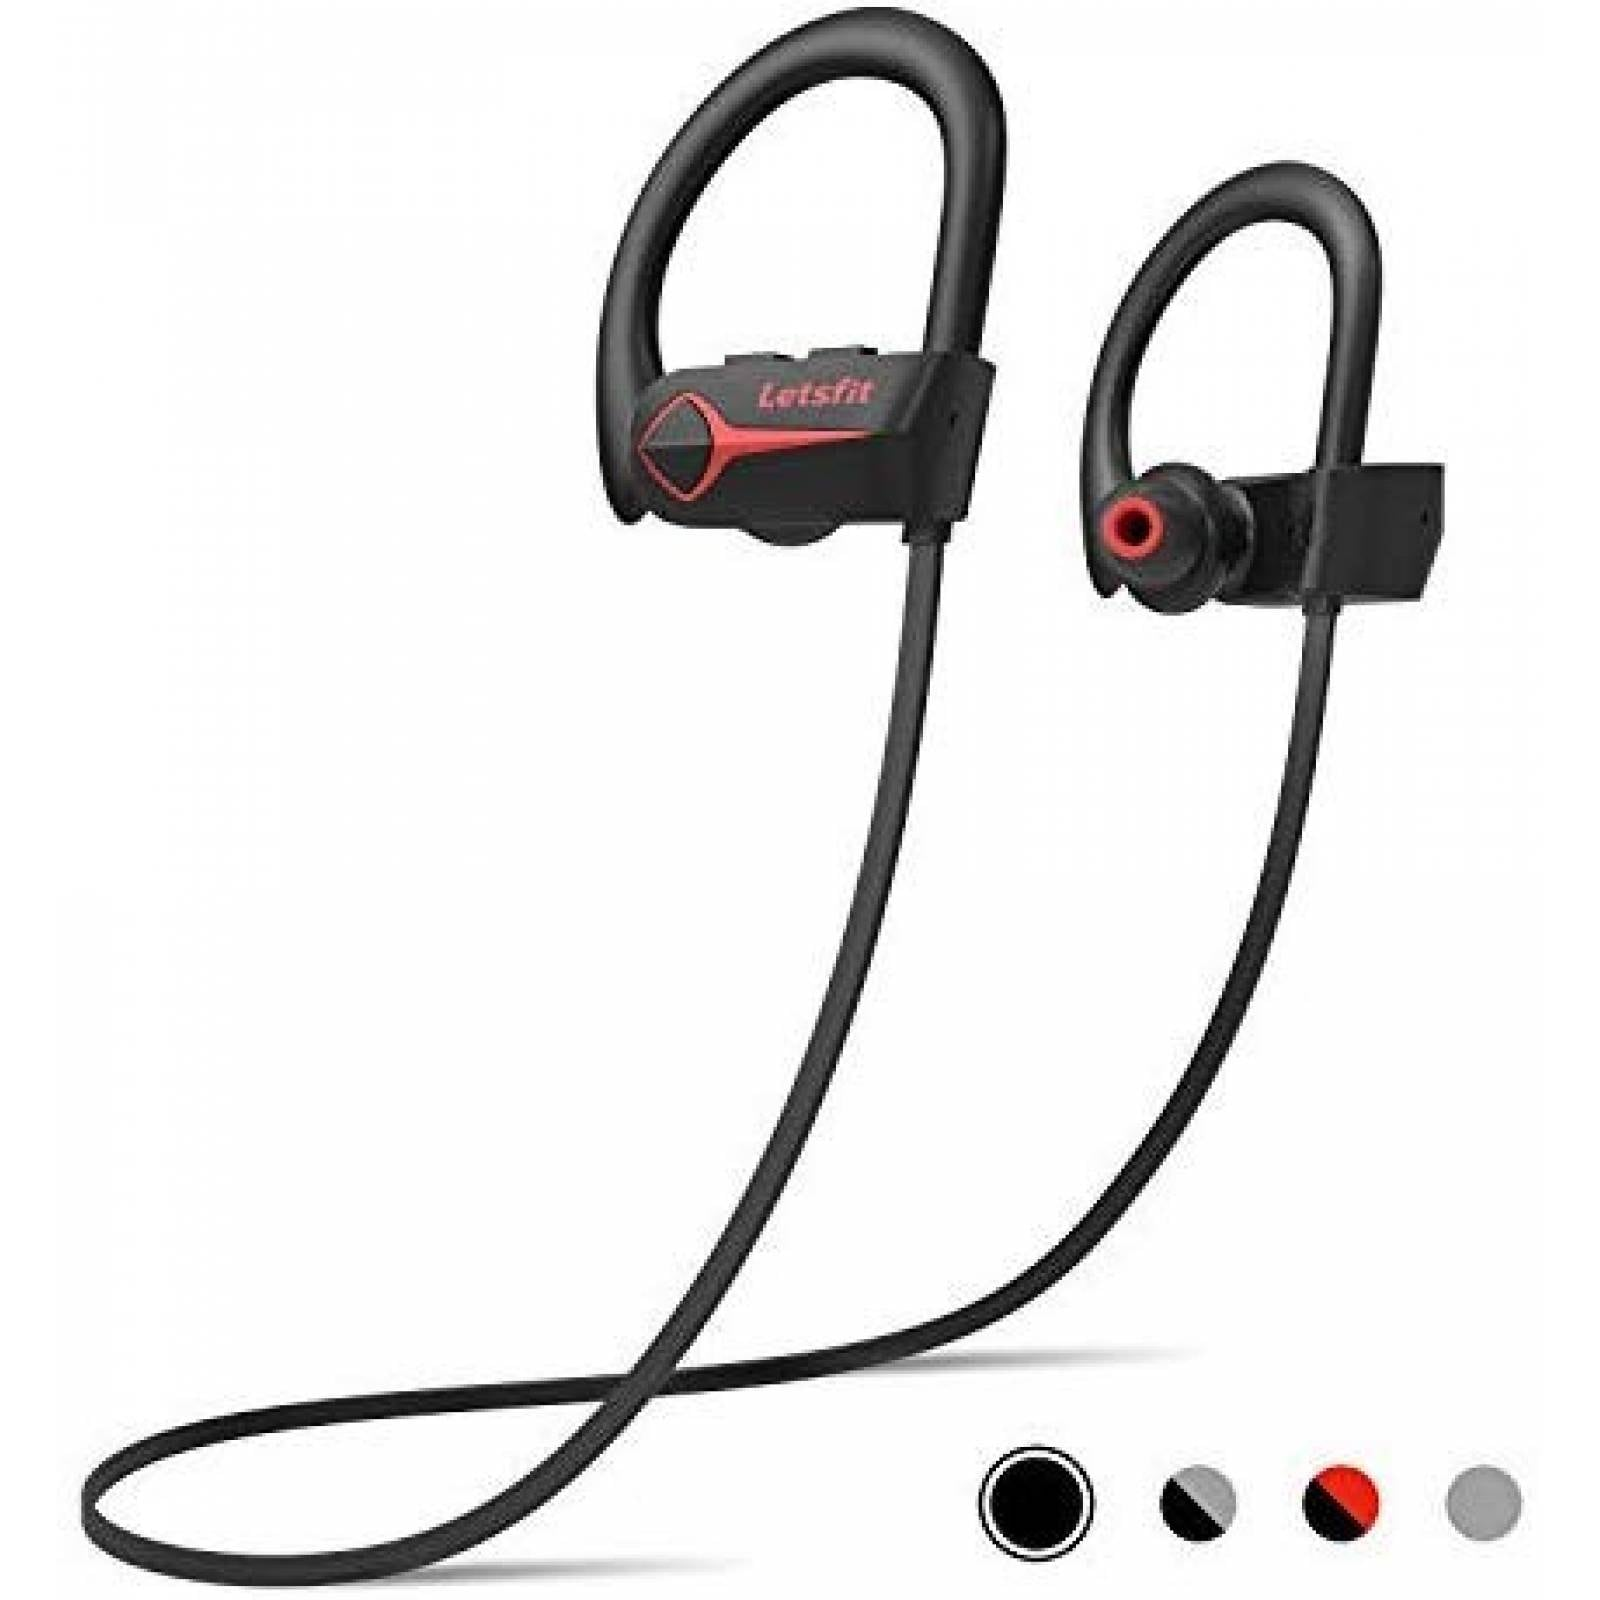 Audífonos Inalámbrico Letsfit Estéreo HiFi Contragaua -Negro